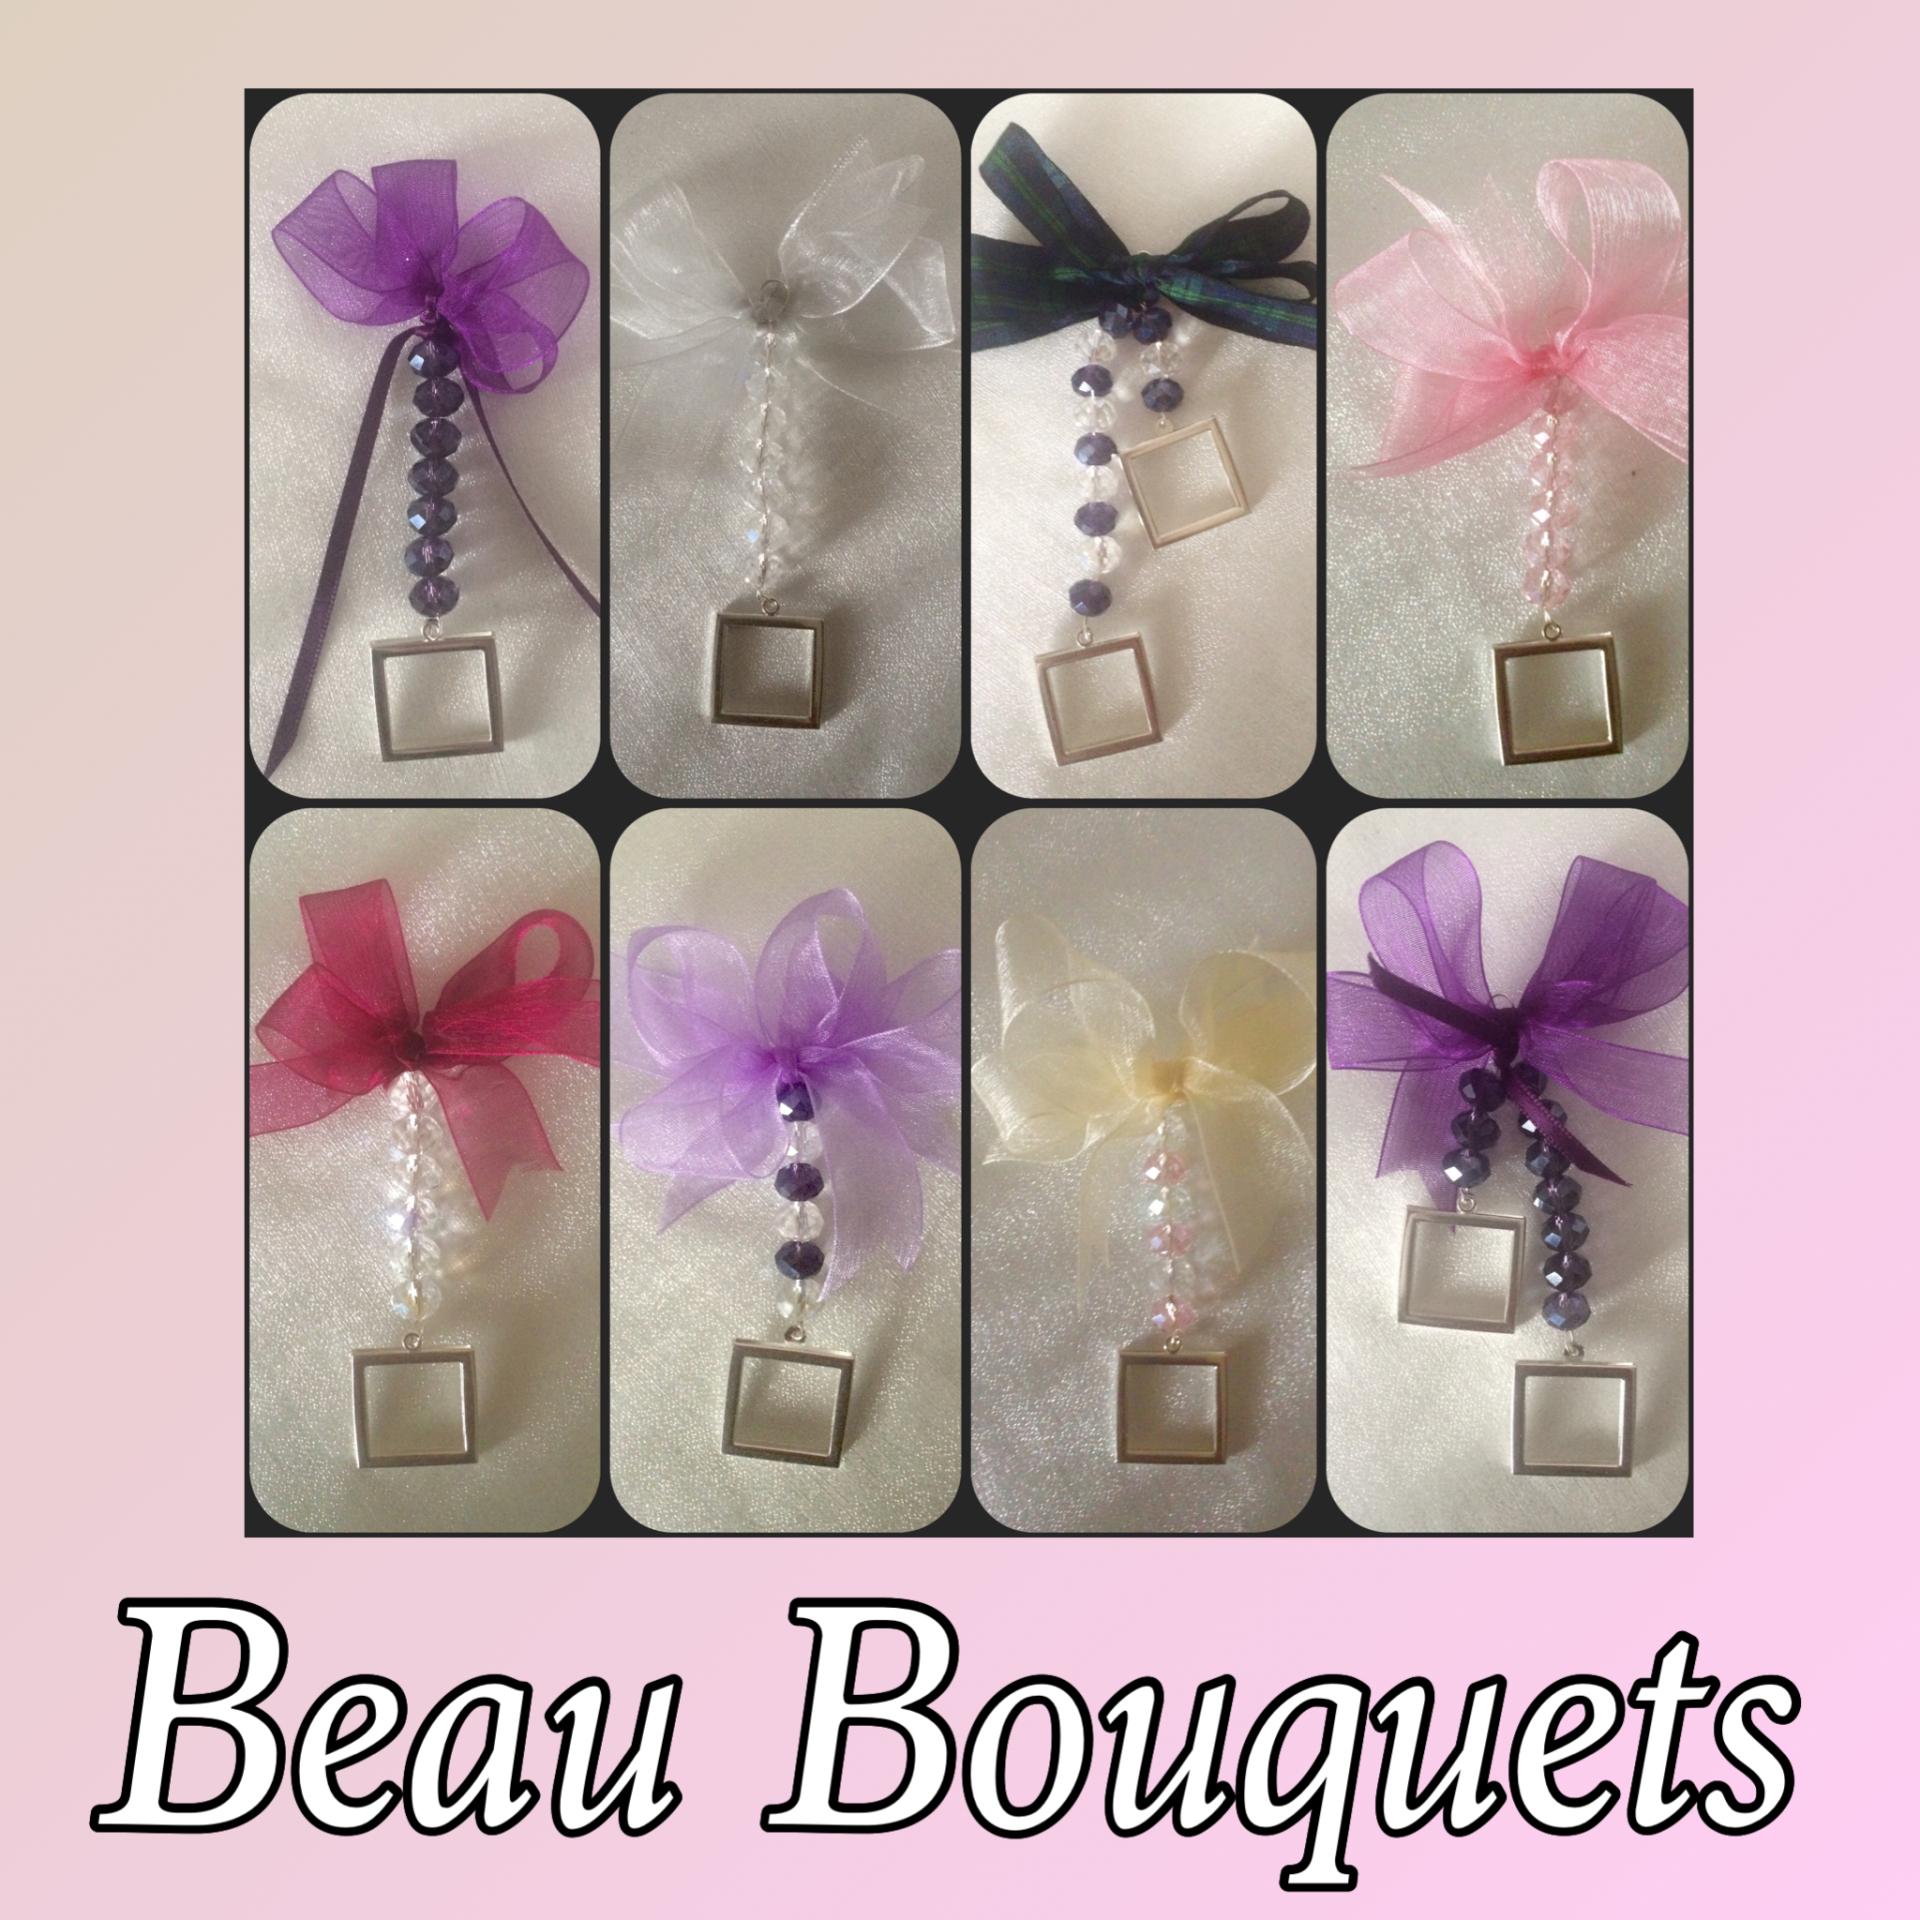 Preciosa crystal Memory Bouquet photo charms £5 single or £7 double